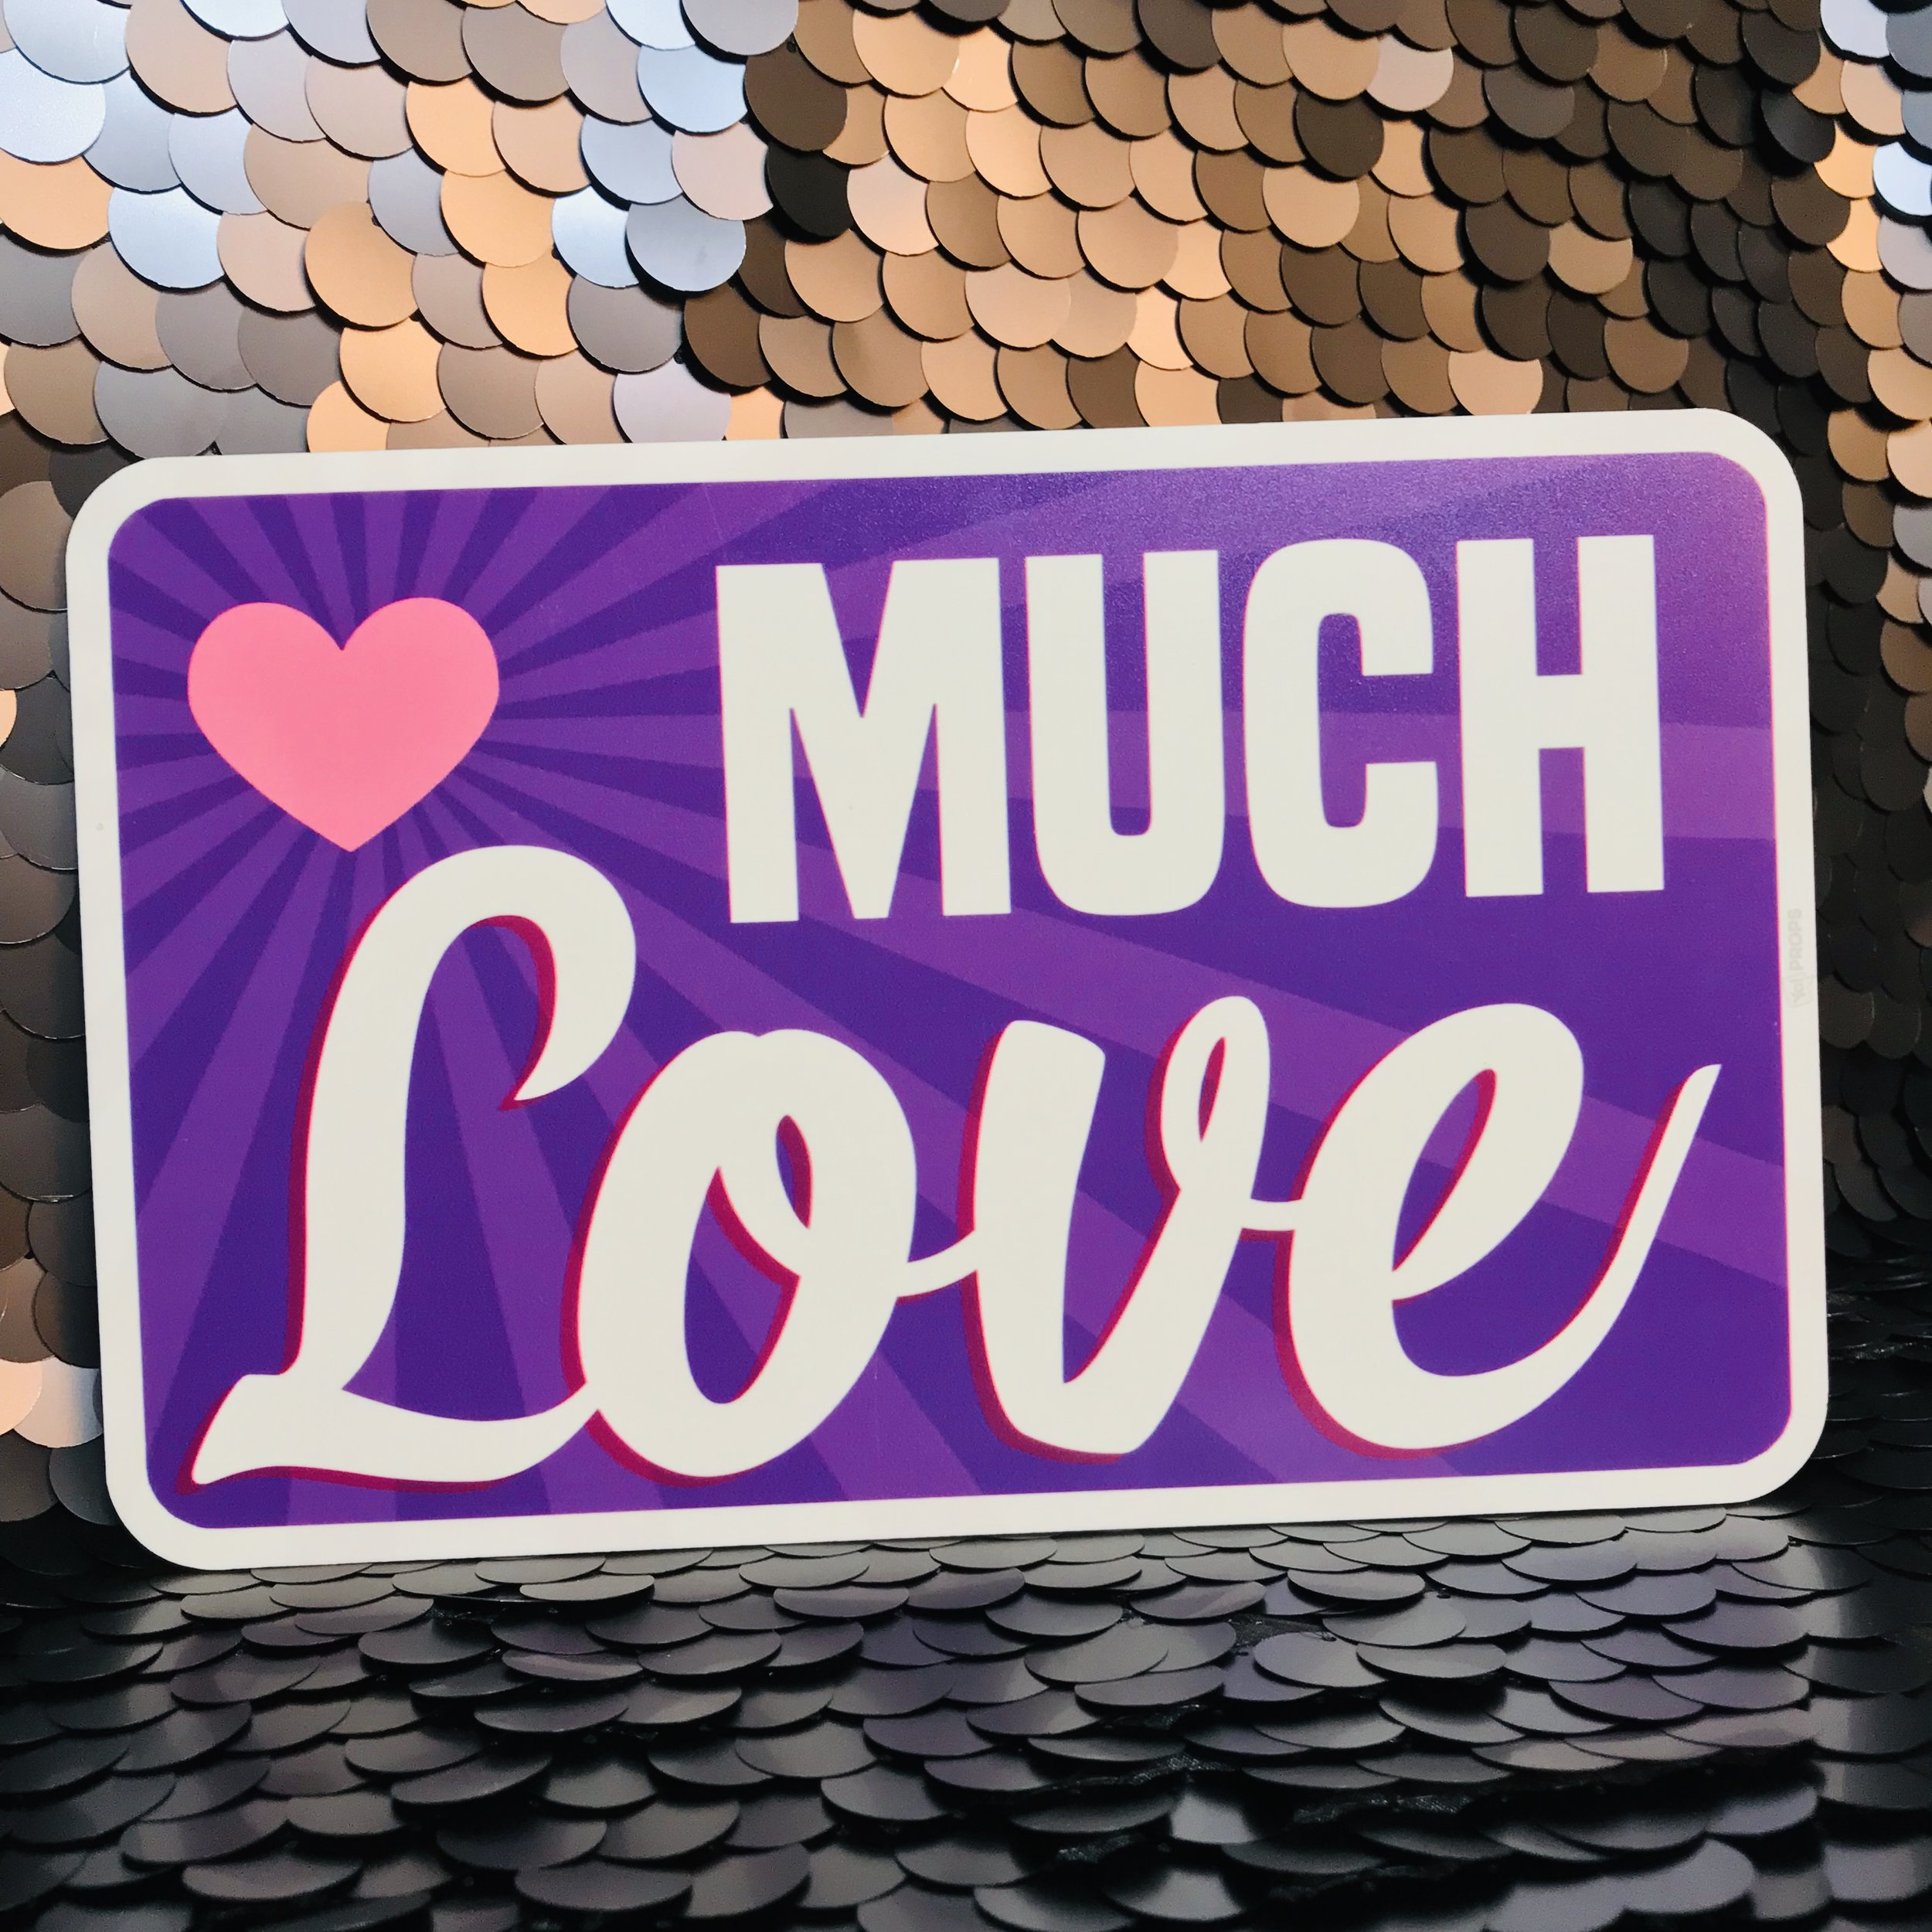 Much Love.jpg